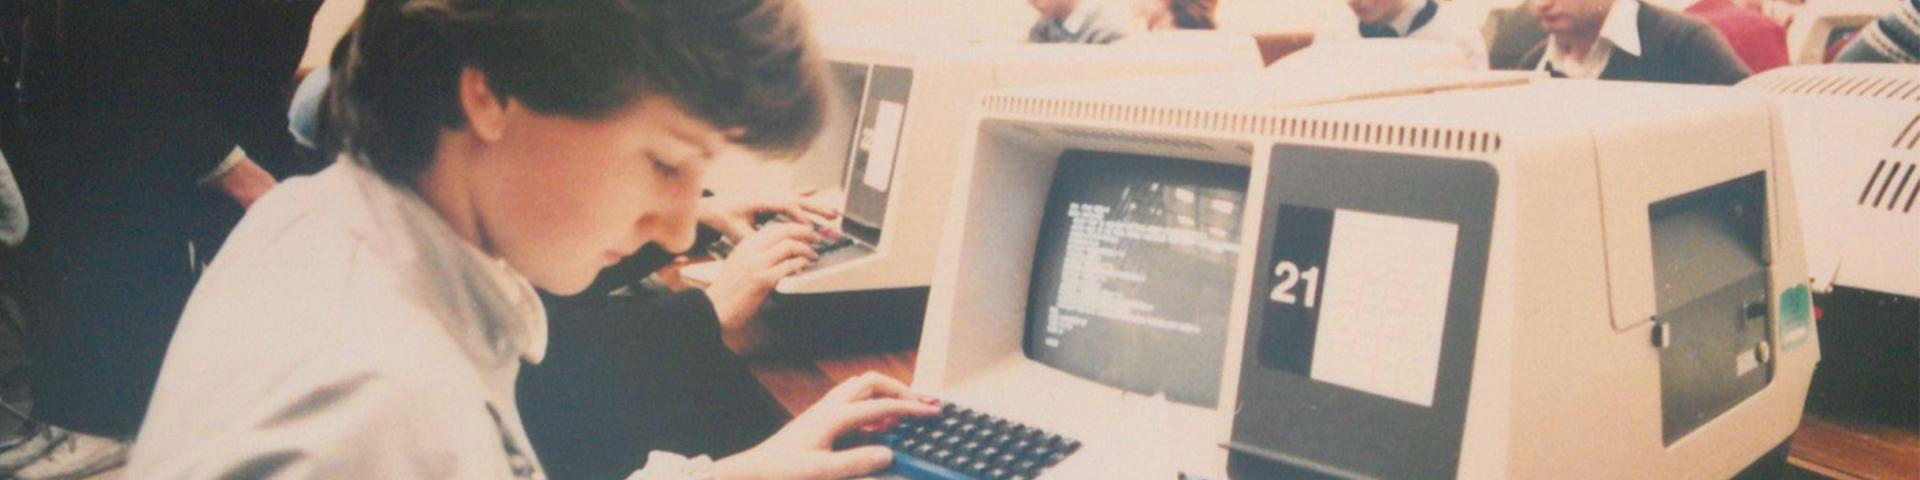 Ищем Web-программистов